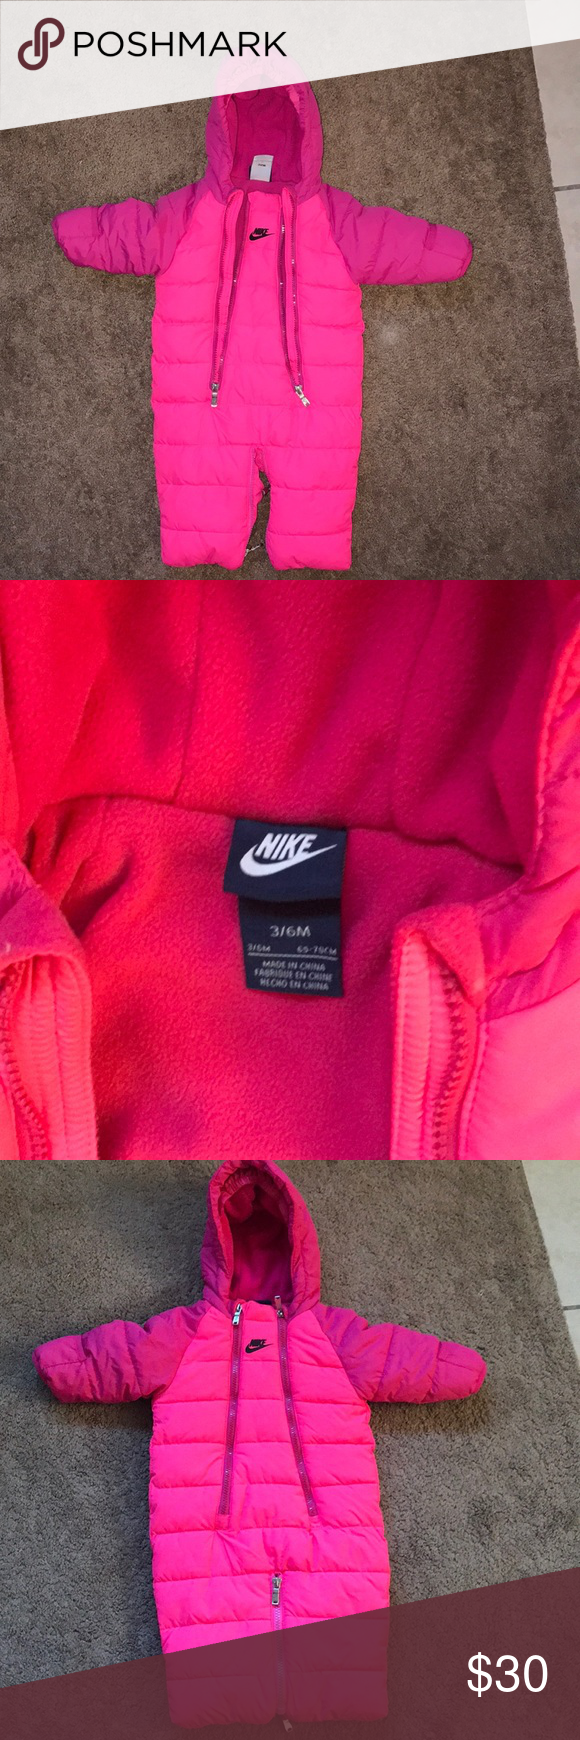 b85bb1a4d Nike baby girl Pink Snowsuit